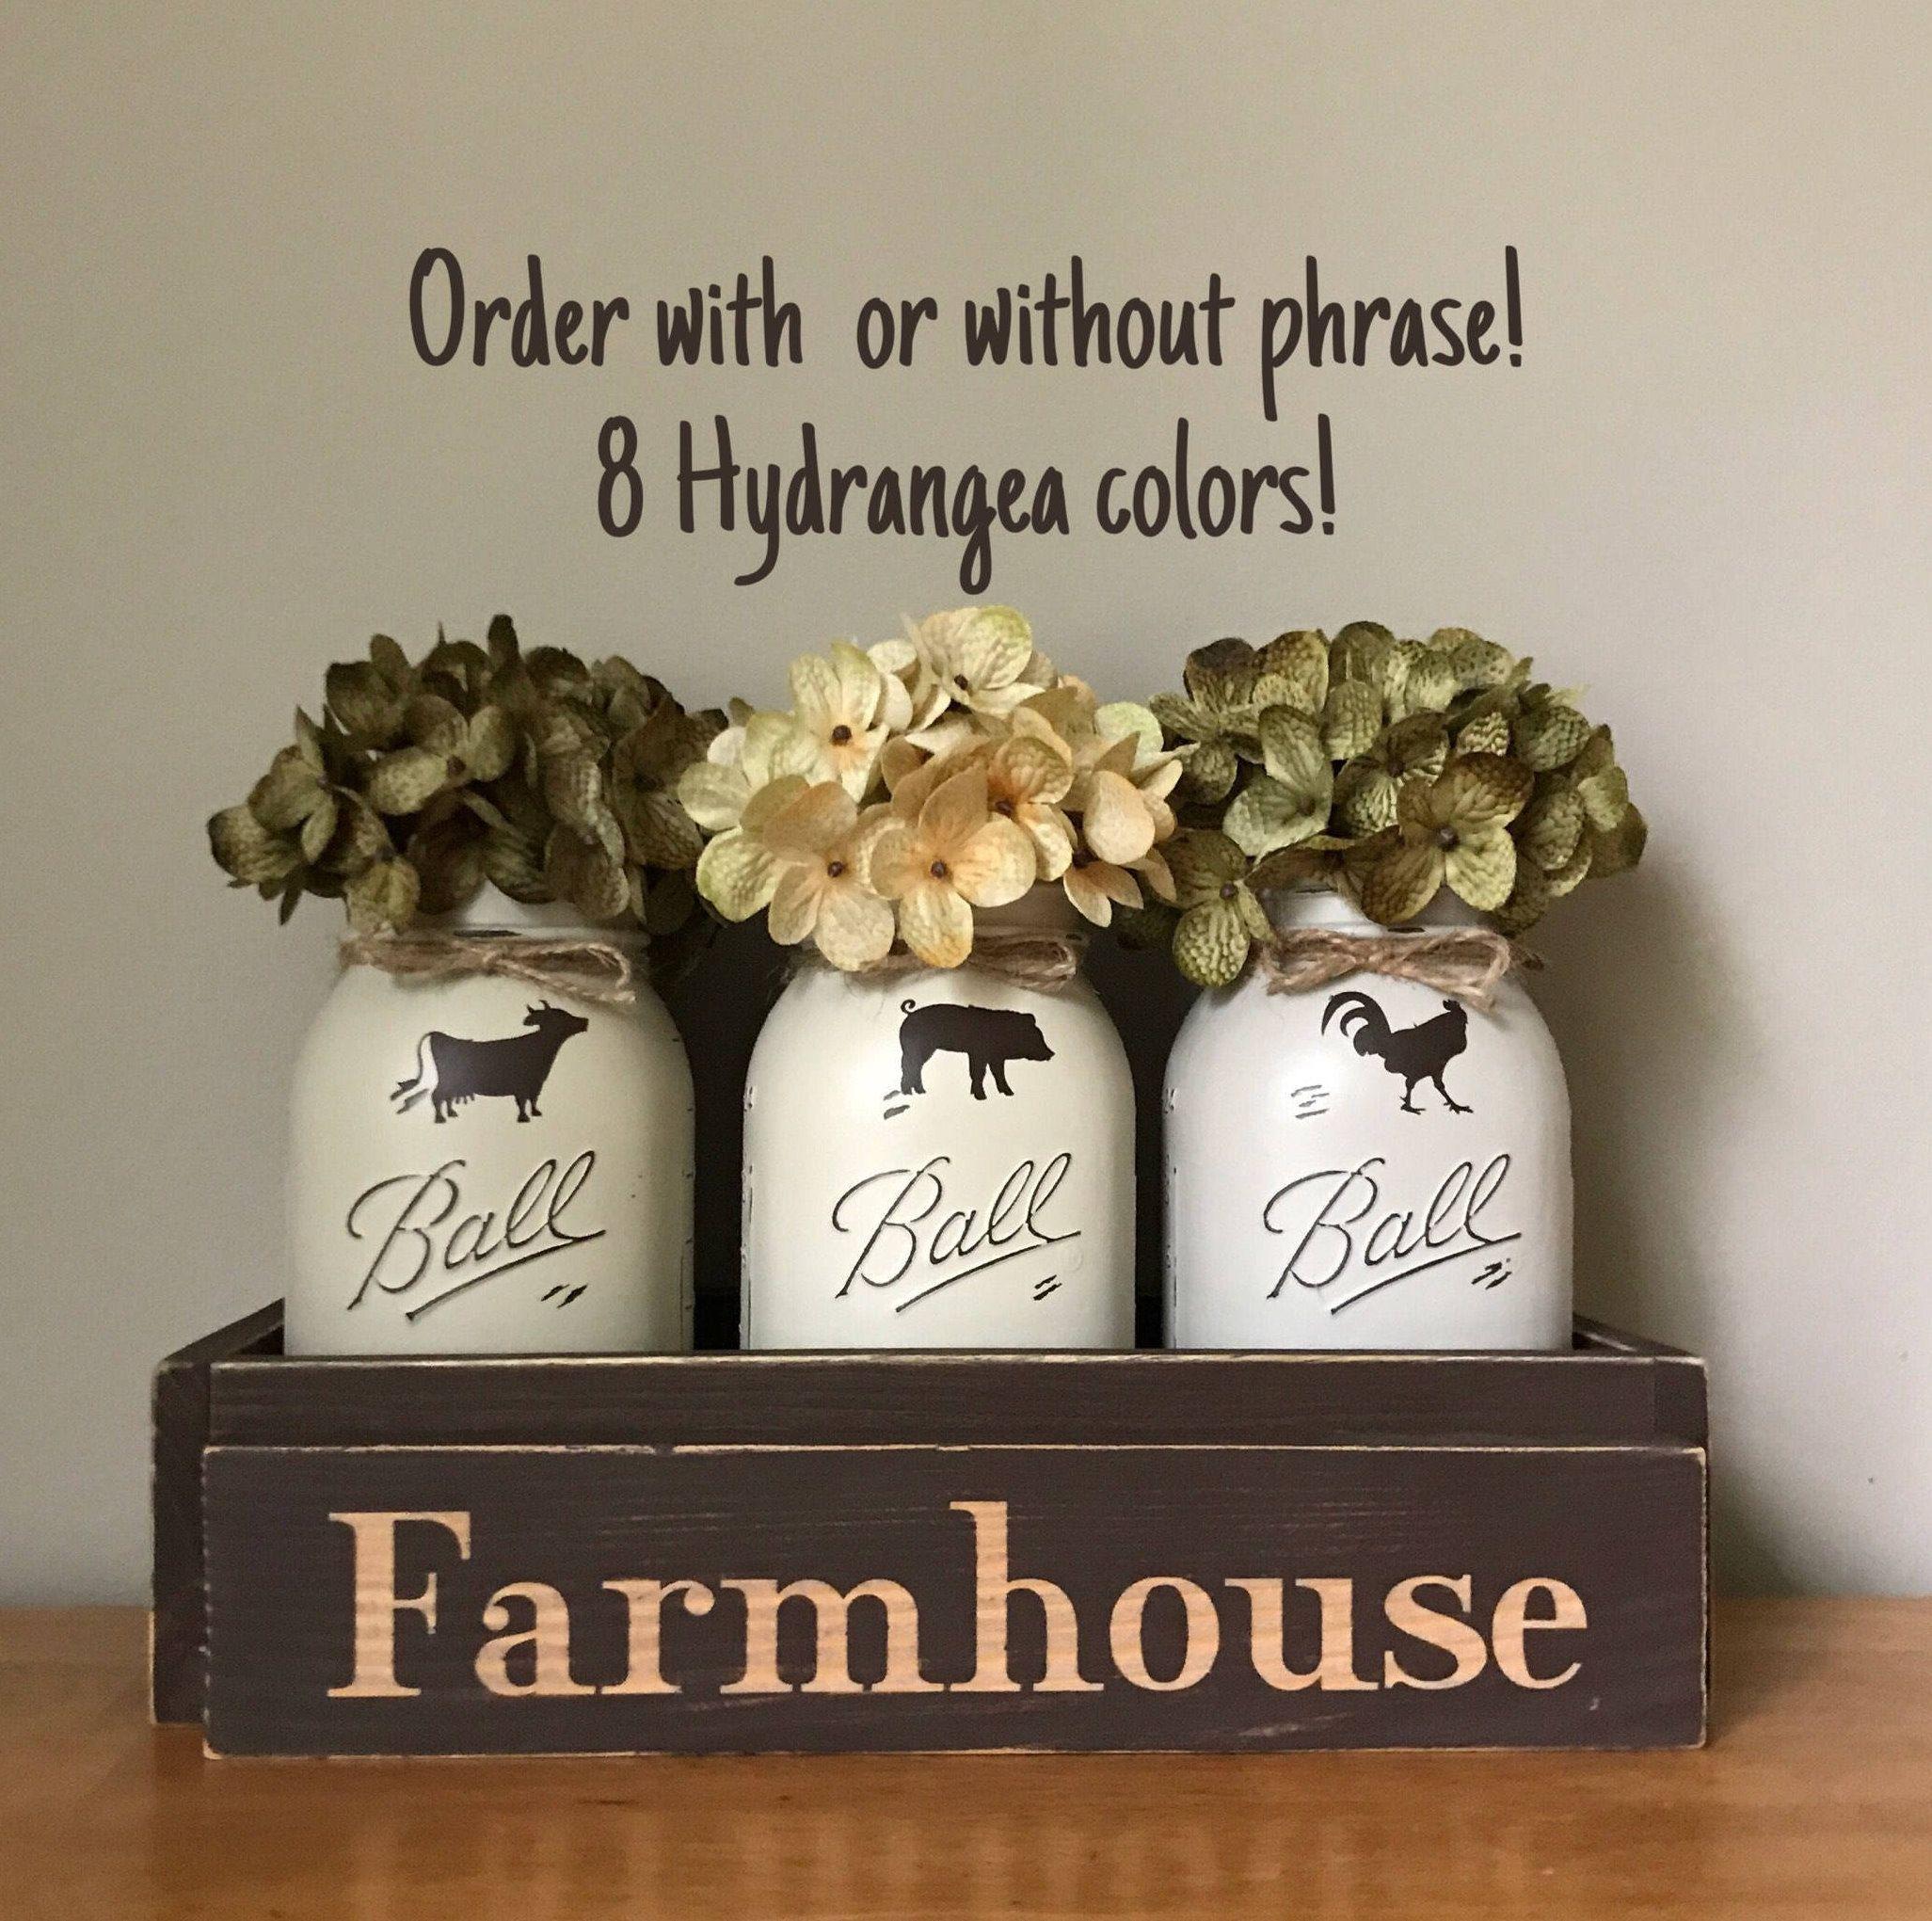 Farmhouse Centerpiece Dining Table Cow Pig Rooster Decor Mason Jar Centerpieces Dining Table Centerpiece Dining Room Table Centerpieces Farmhouse Centerpiece